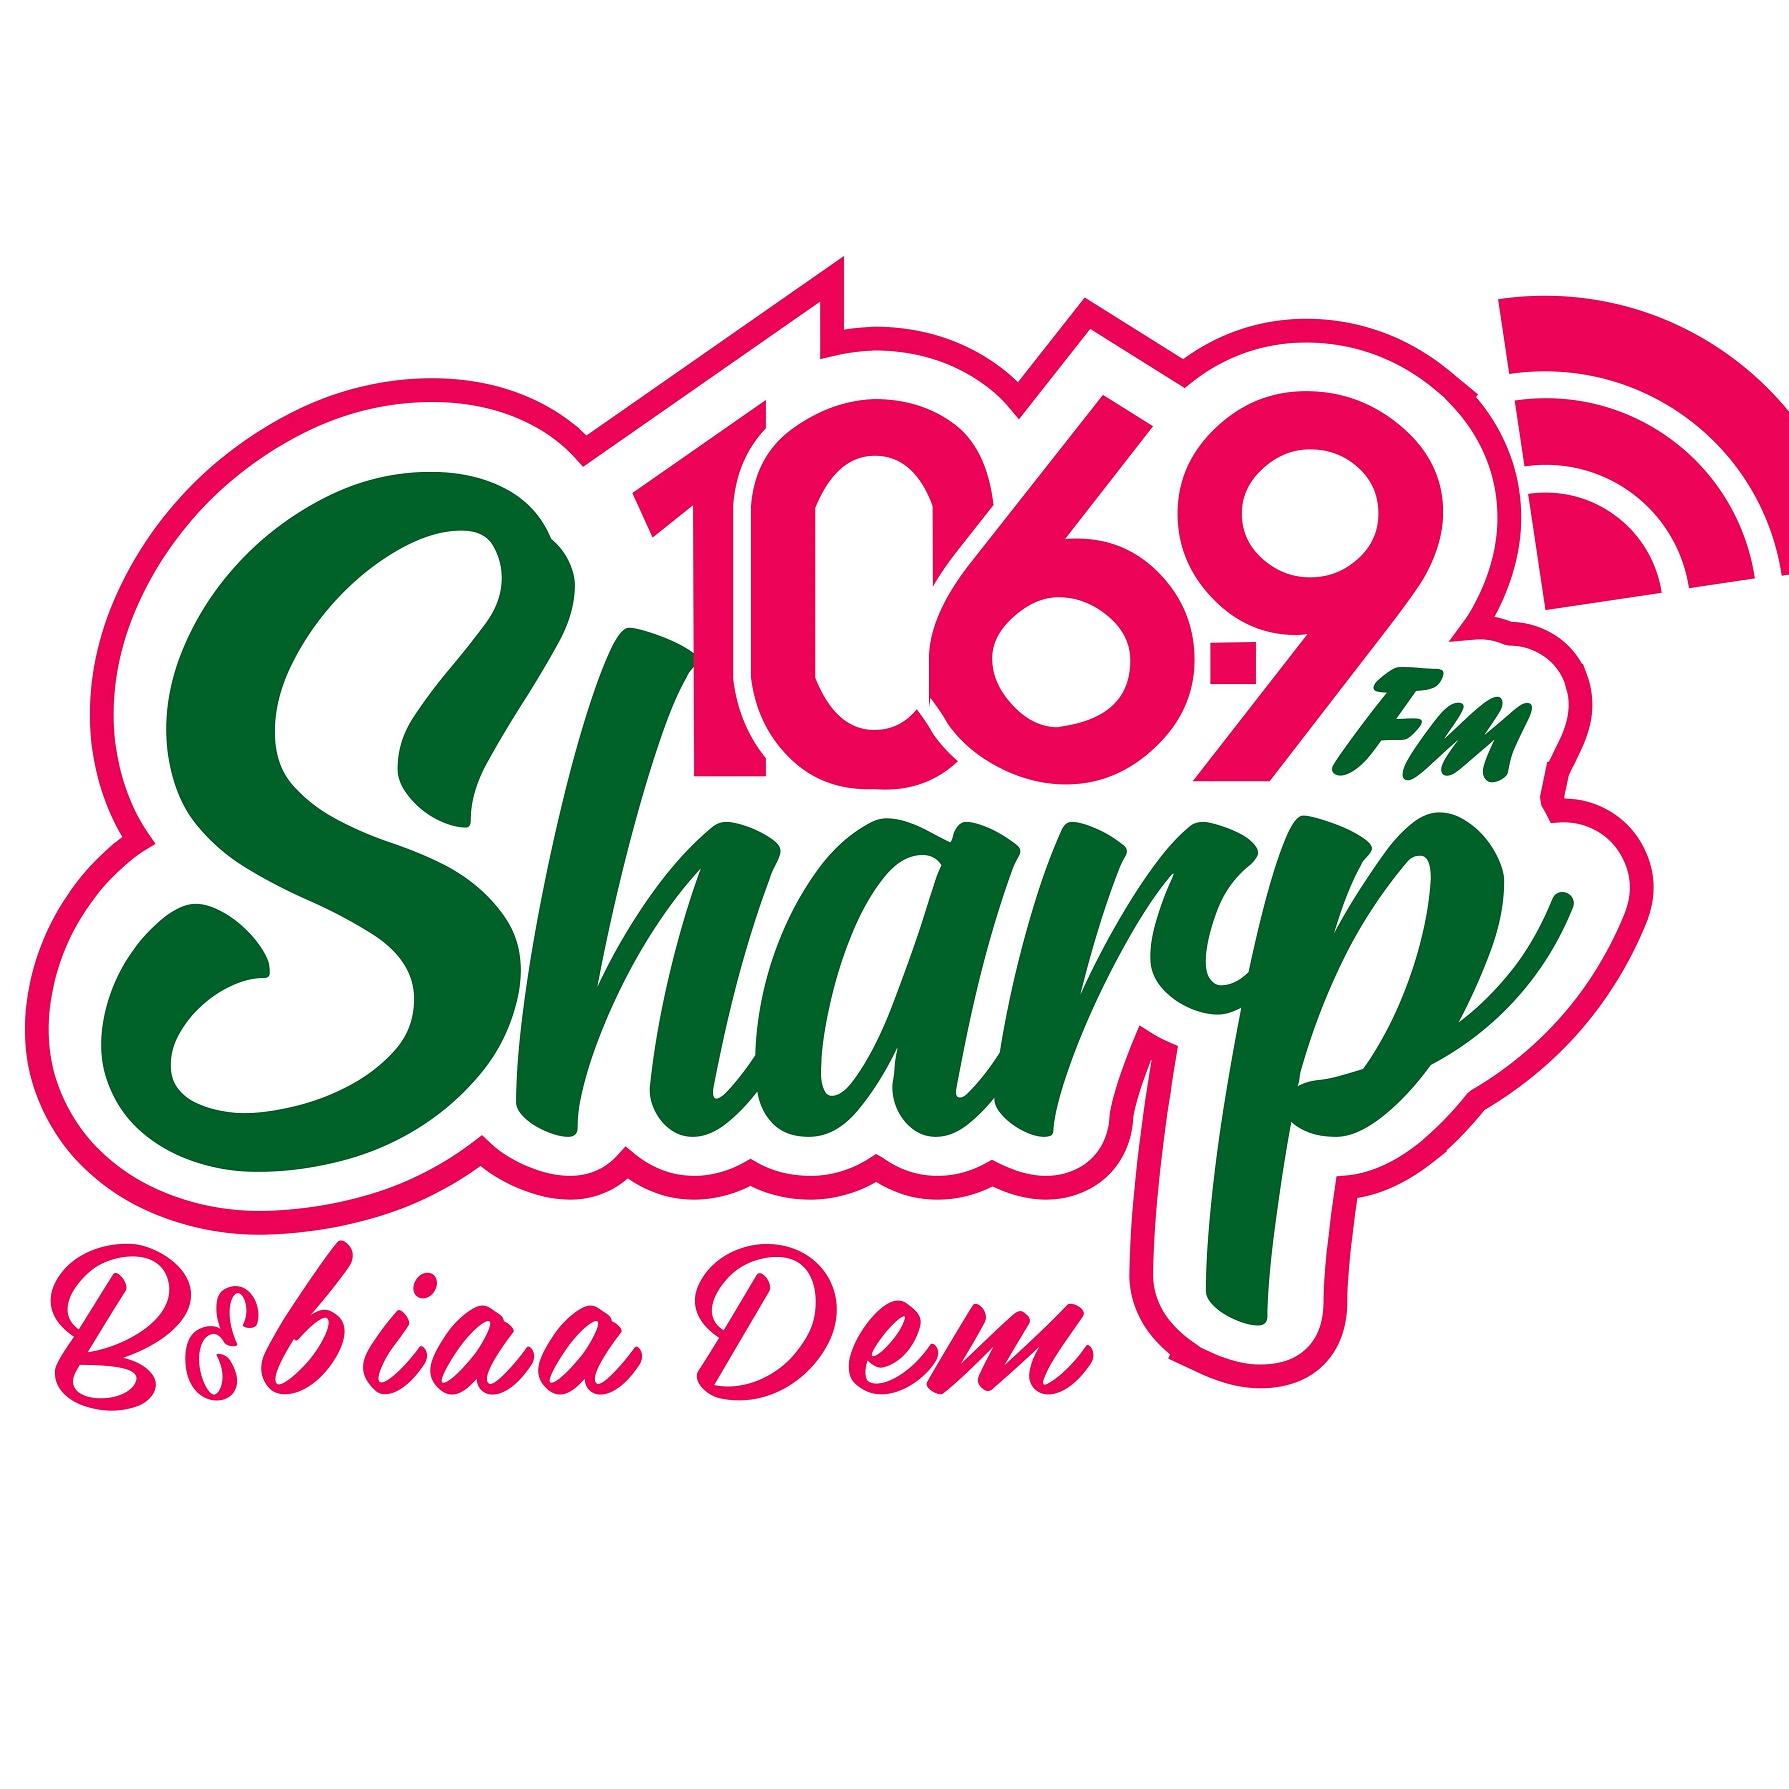 Sharpp 106.9fm